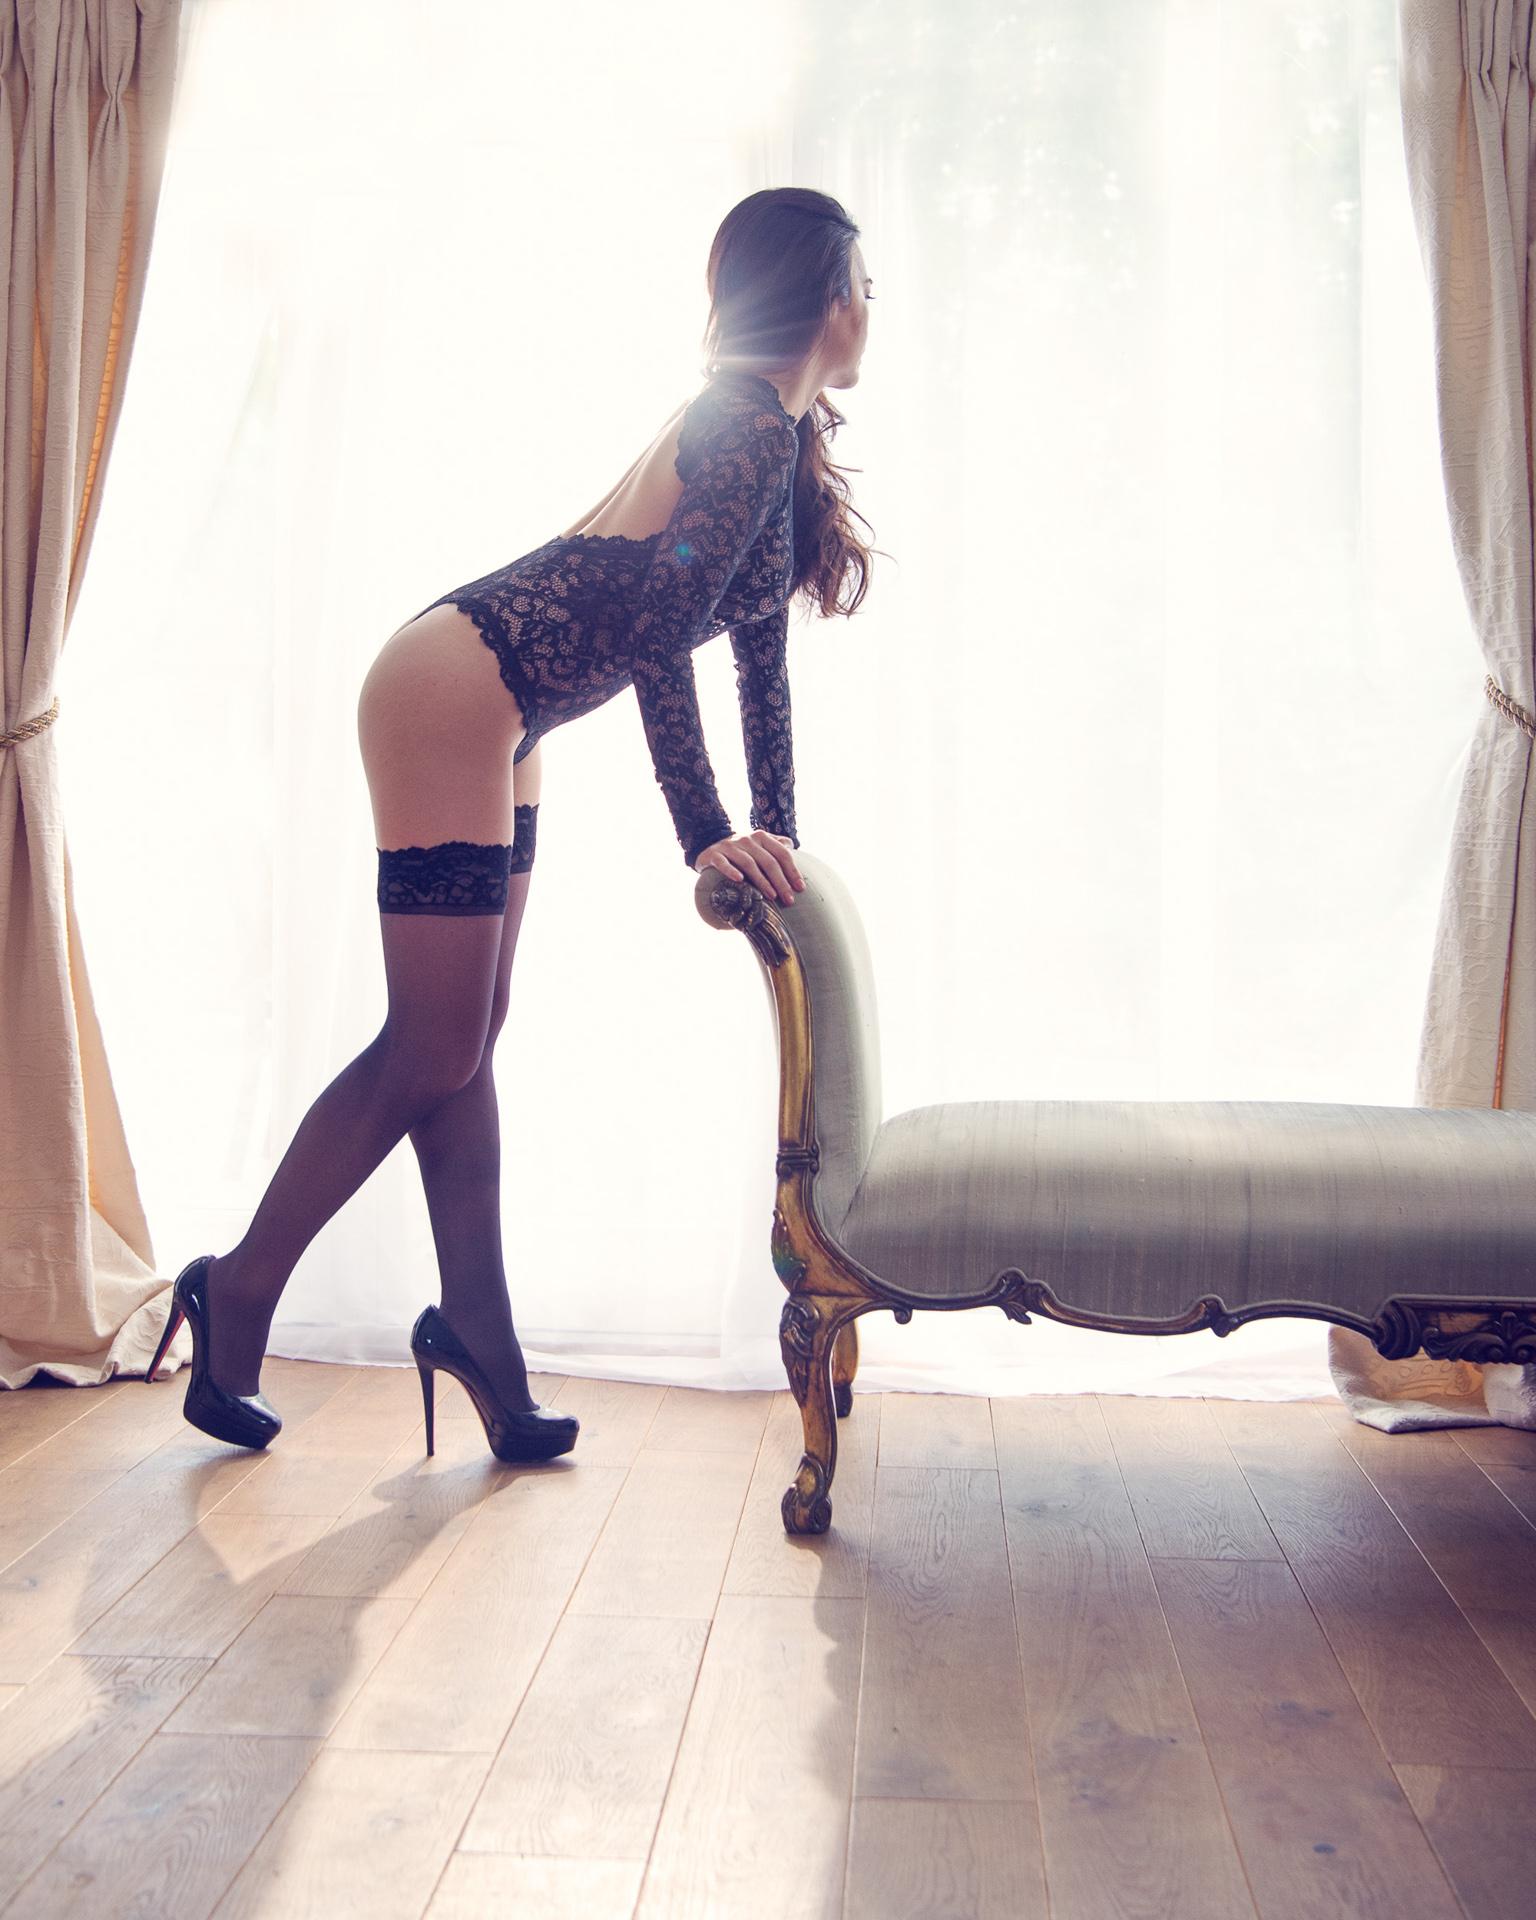 https://katehopewellsmith.com/wp-content/uploads/boudoir-photography-inspiration-kate-hopewell-smith-5.jpg